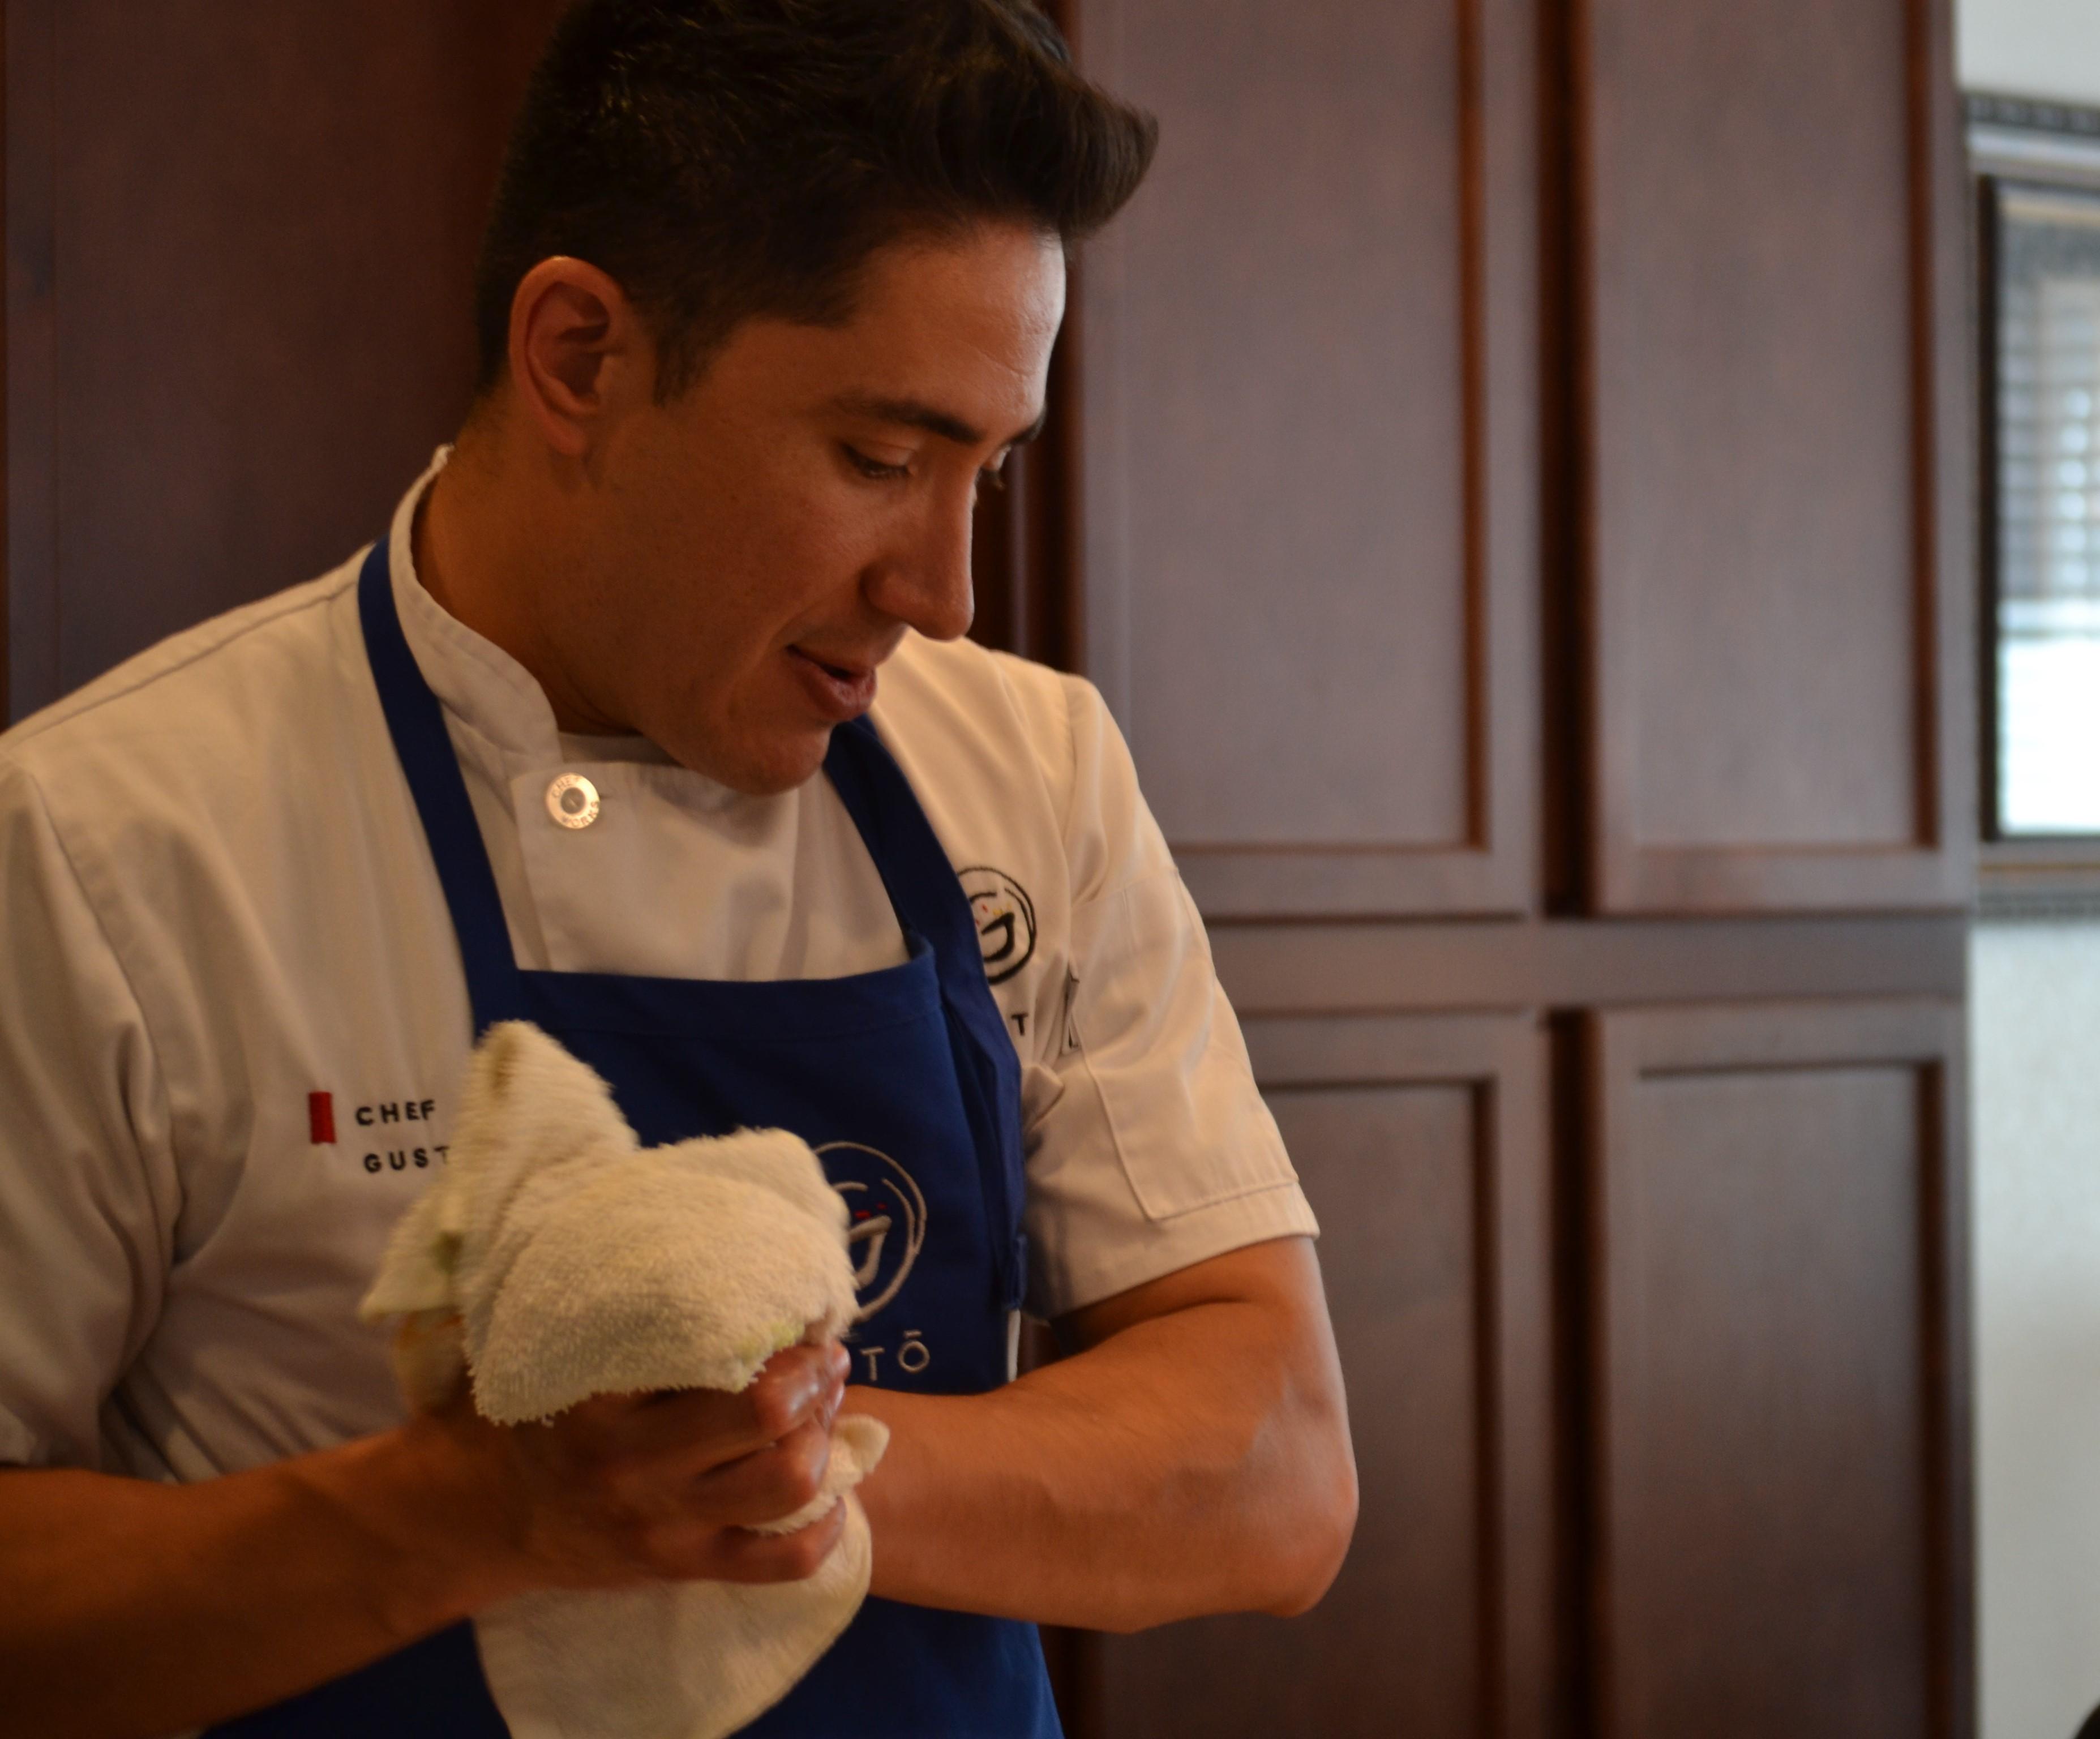 Gustavo Velasco Jara, wiping his hands and admiring his work.